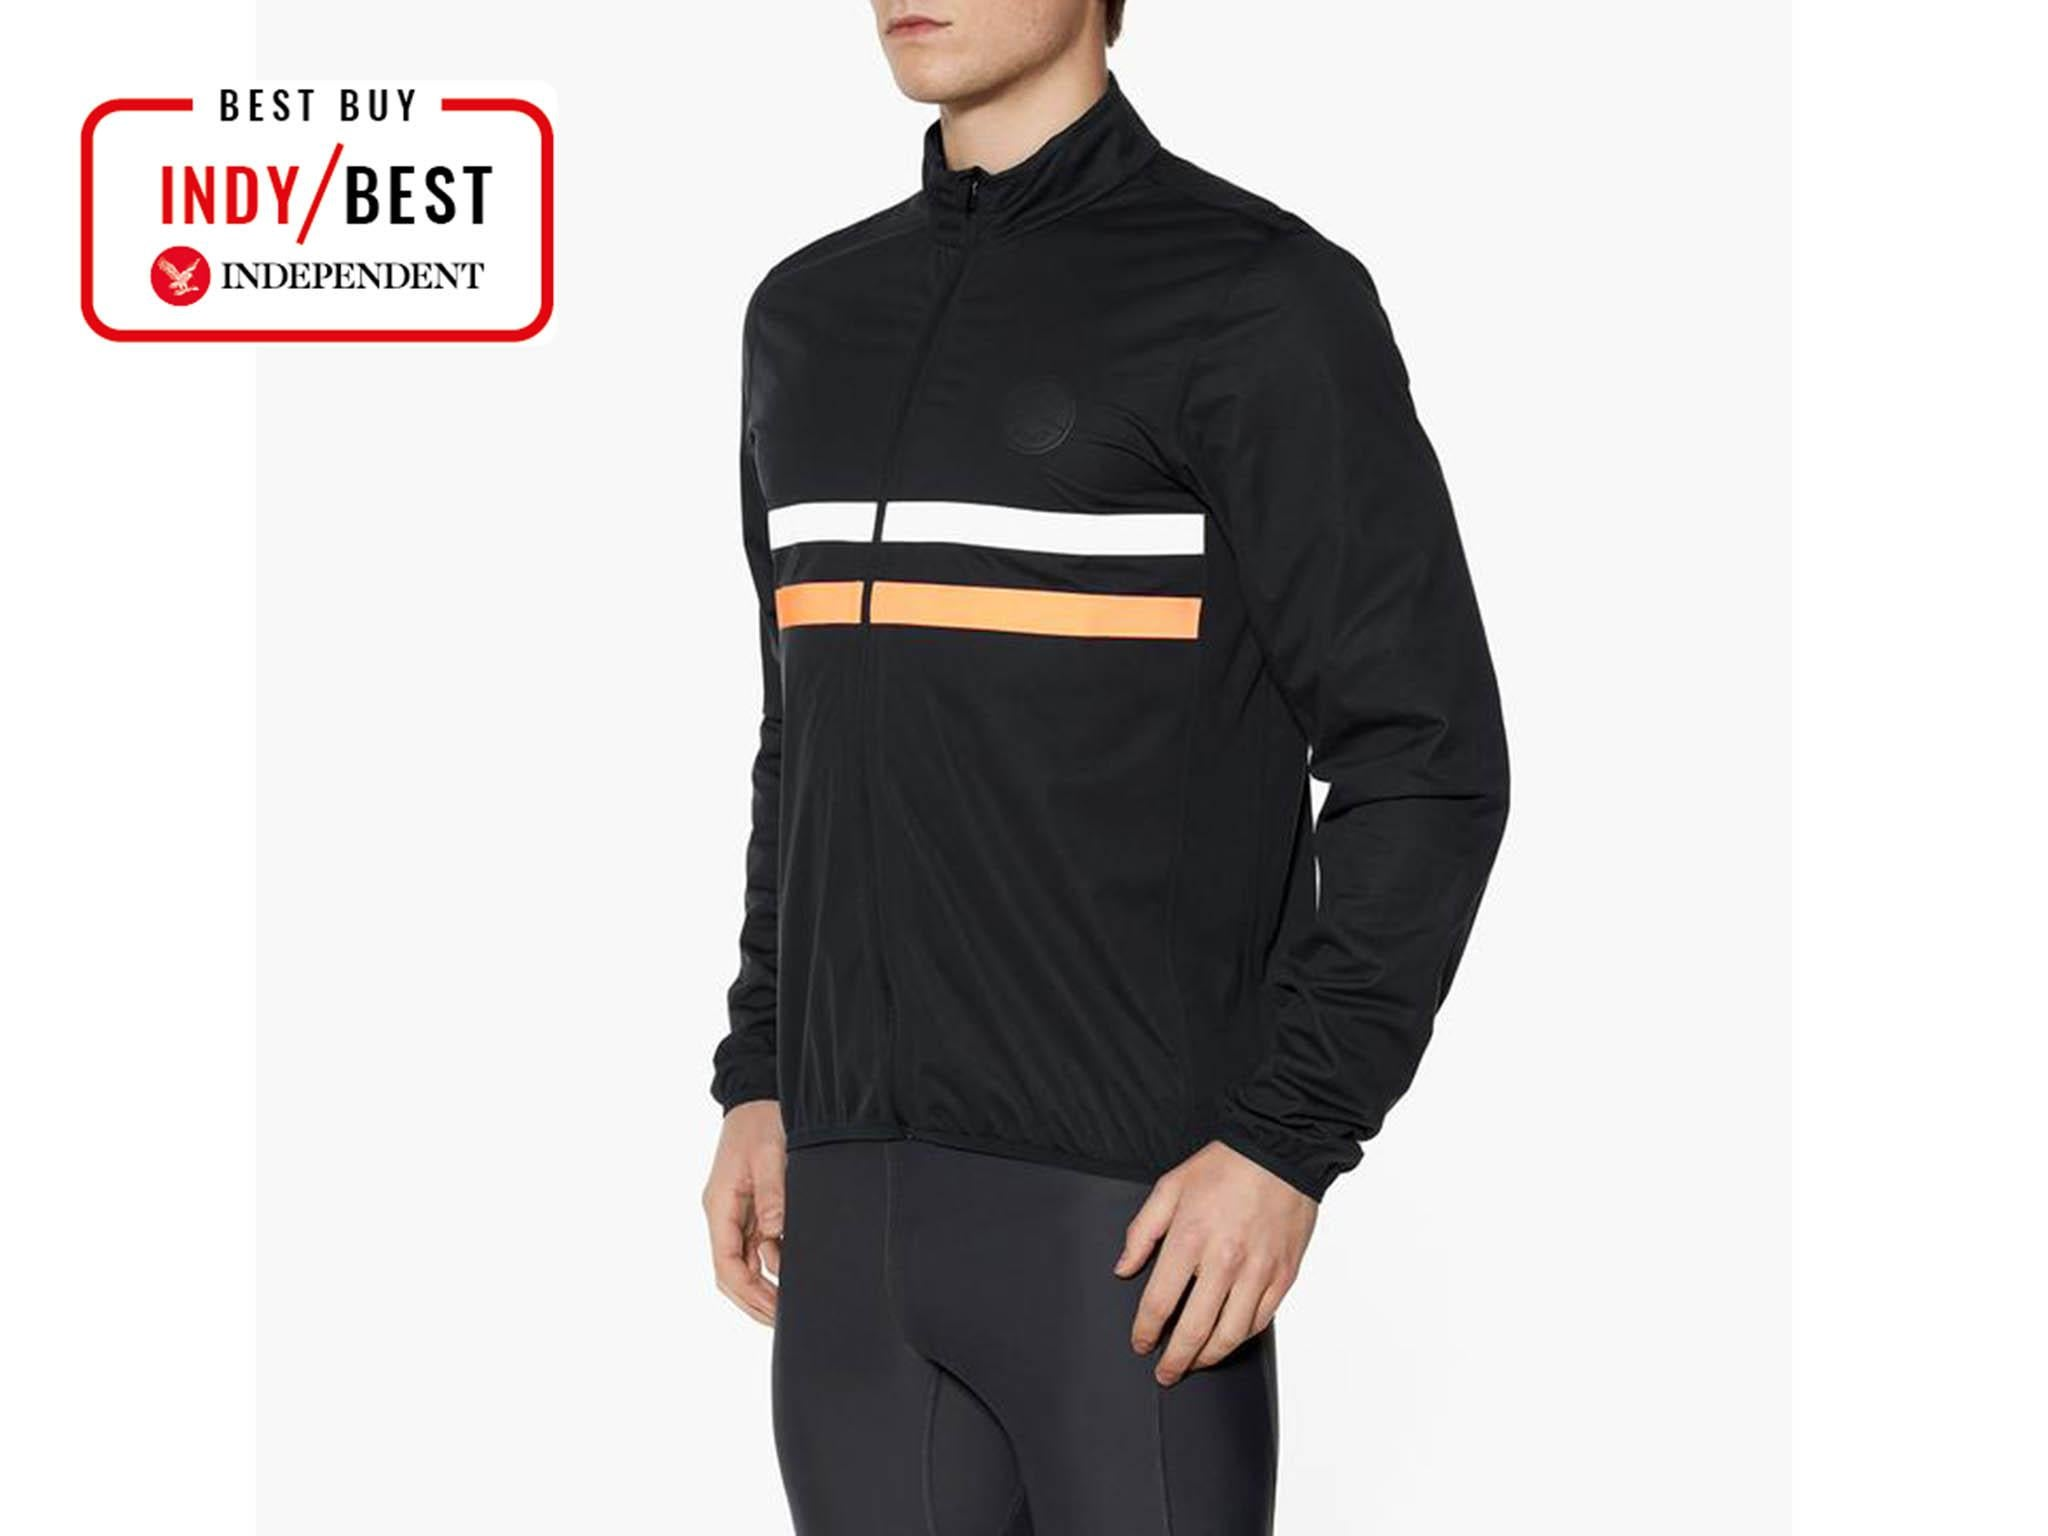 5 winter running jackets reviewed